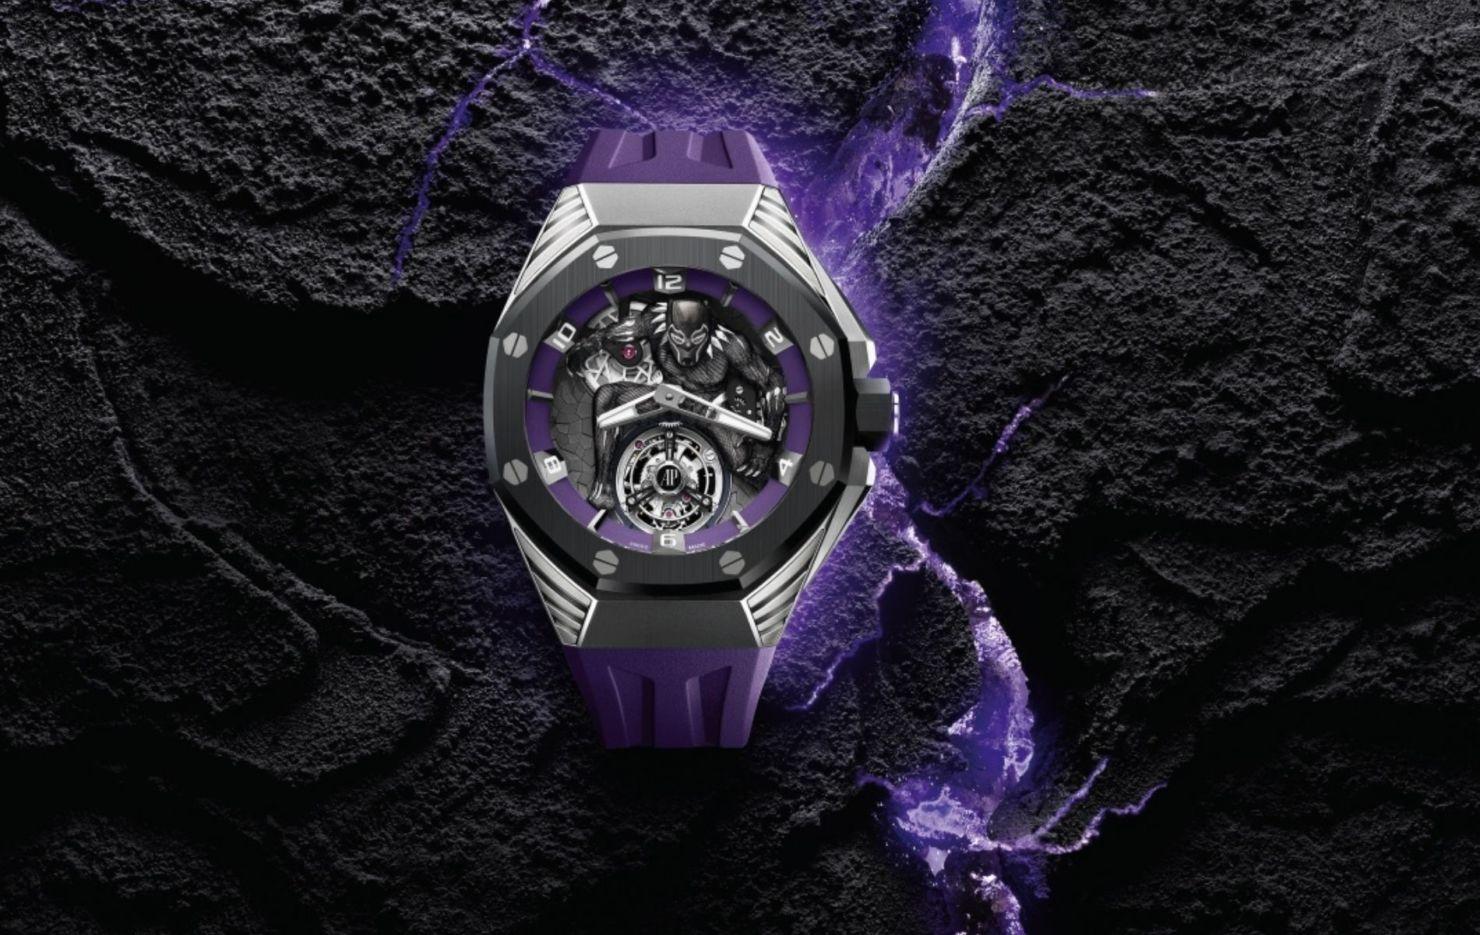 Audemars Piguet rinde tributo a Black Panther con un magnífico reloj